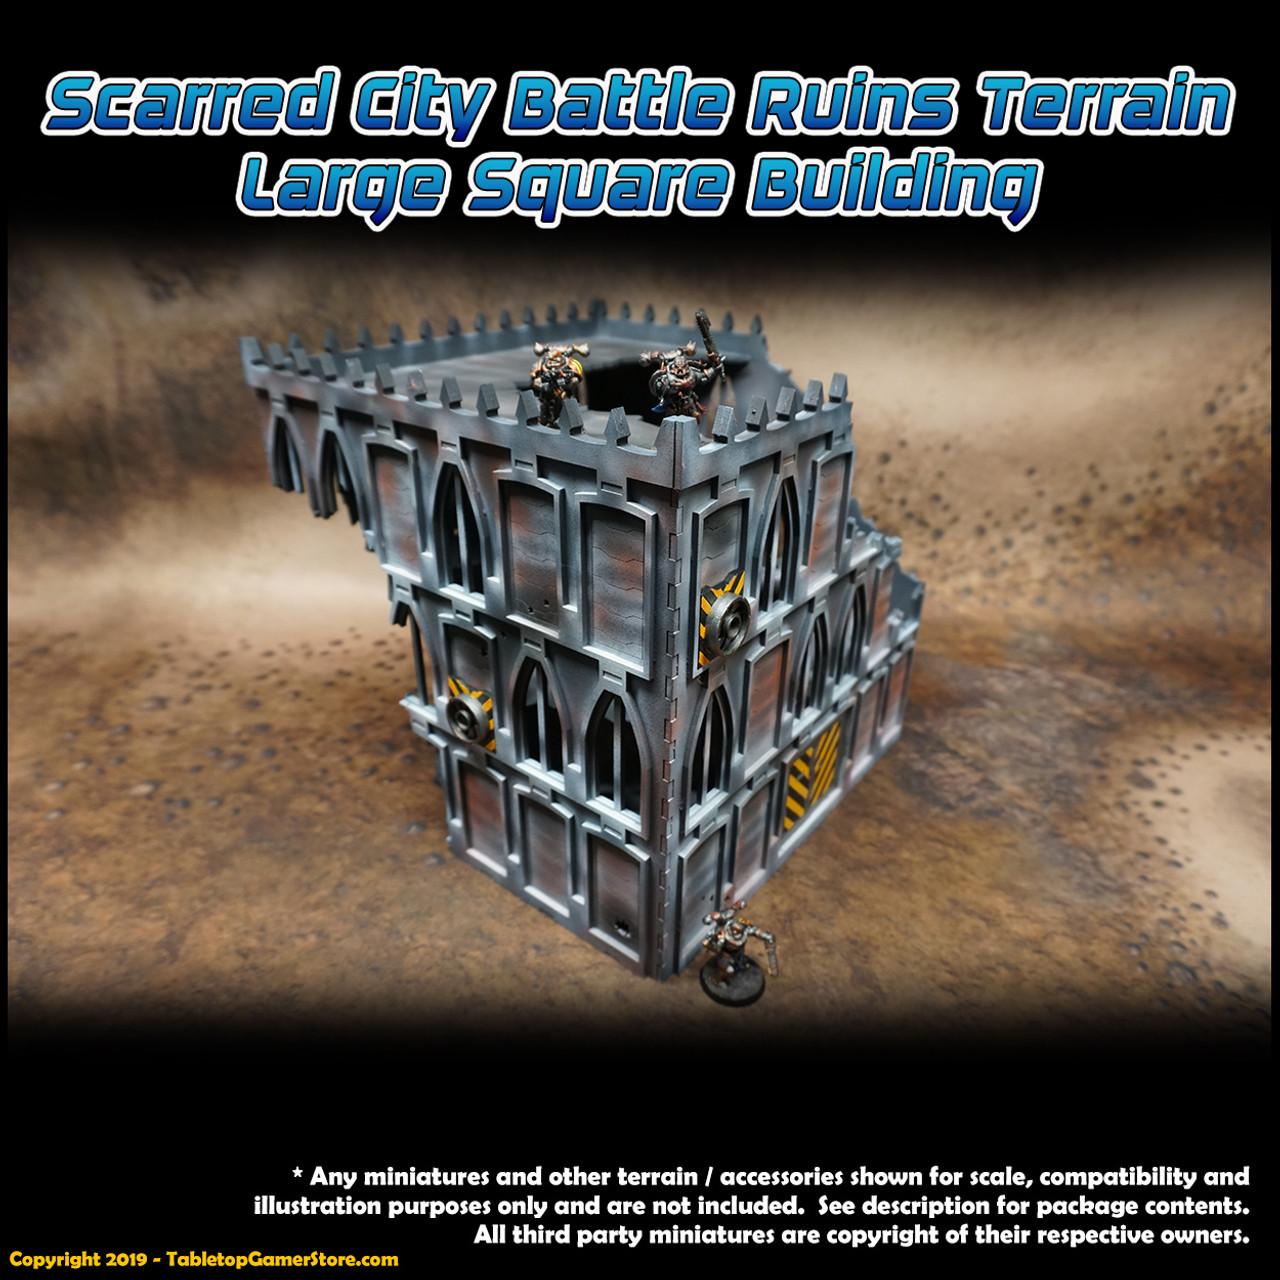 Scarred City Battle Ruins Terrain - Large Square Building